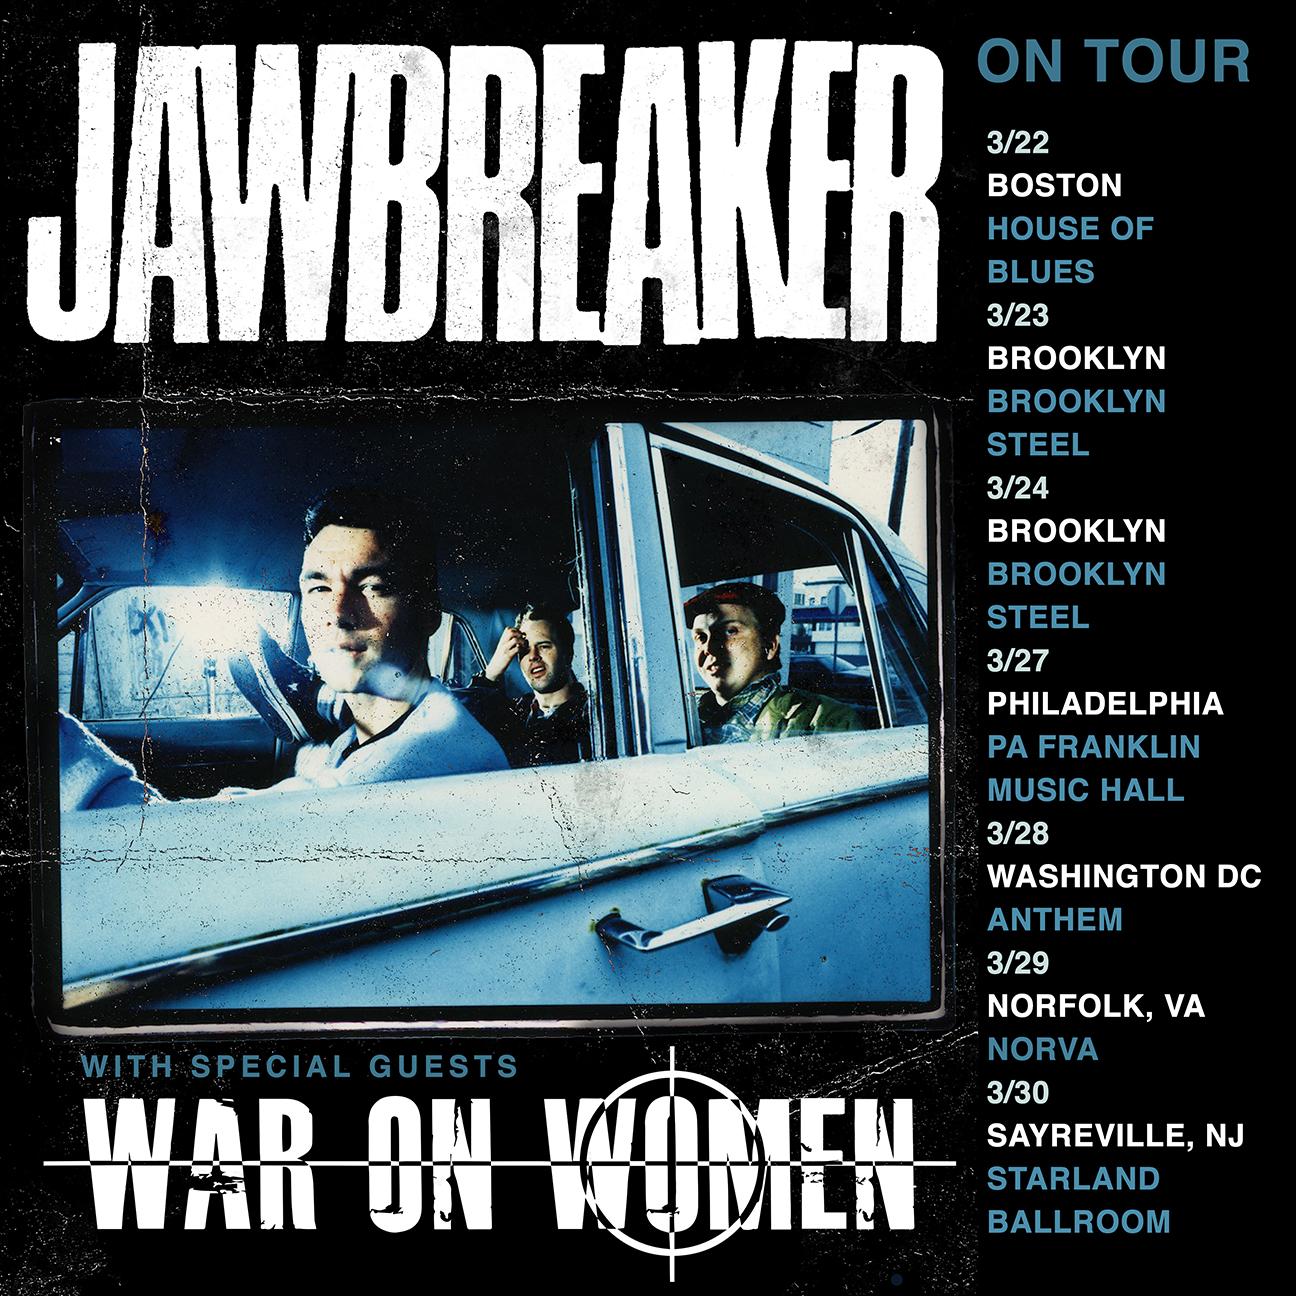 JAWBREAKER_WarOnWomen_EastCoast_2019_admat_with-dates_18x18.jpg